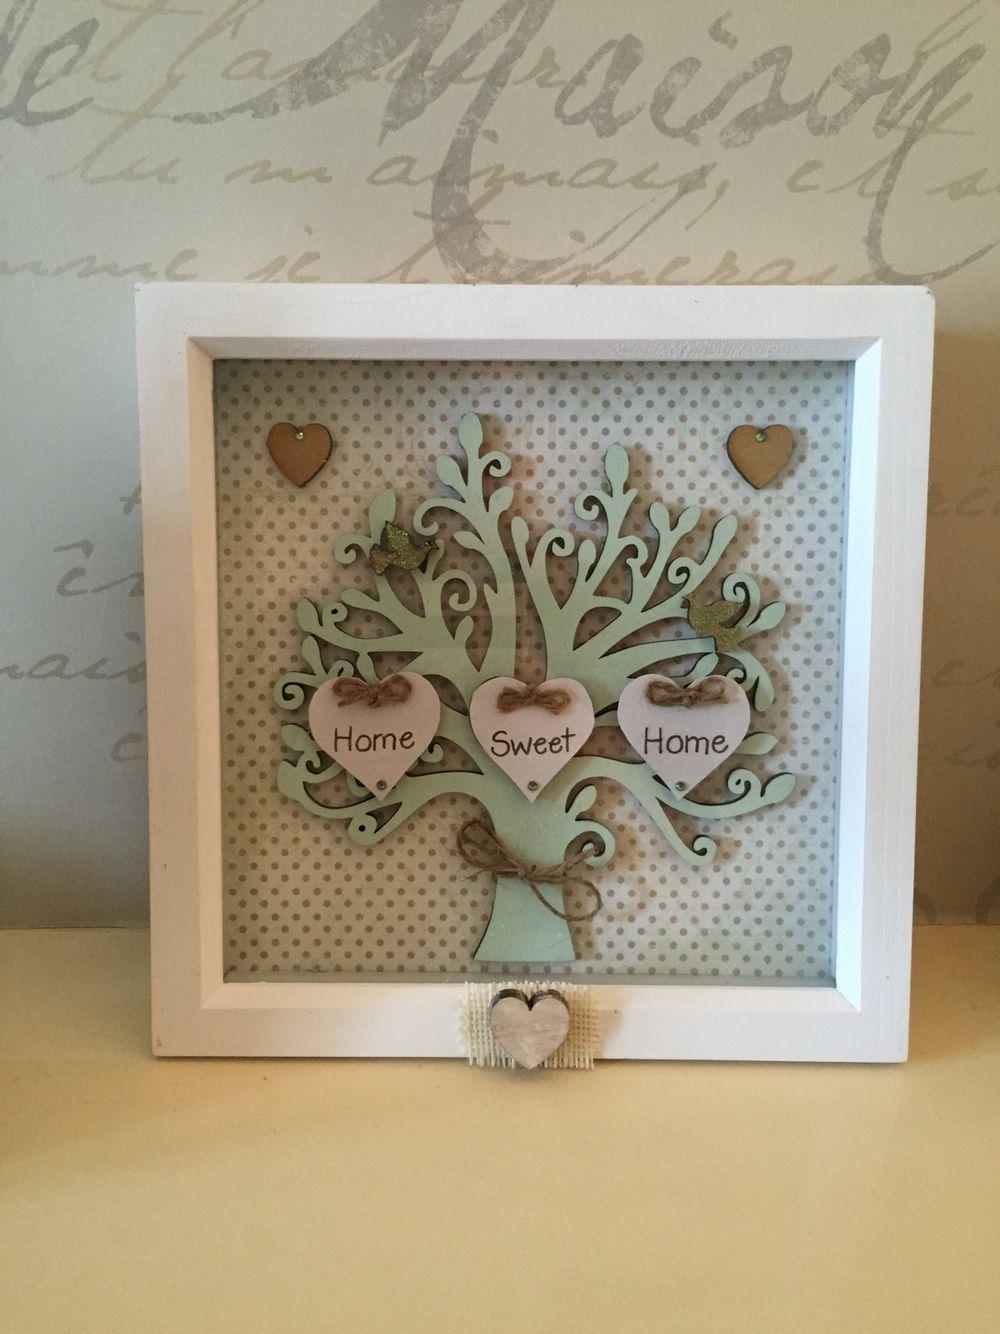 3D box frame   Hayleys Home touches   Pinterest   3d box frames